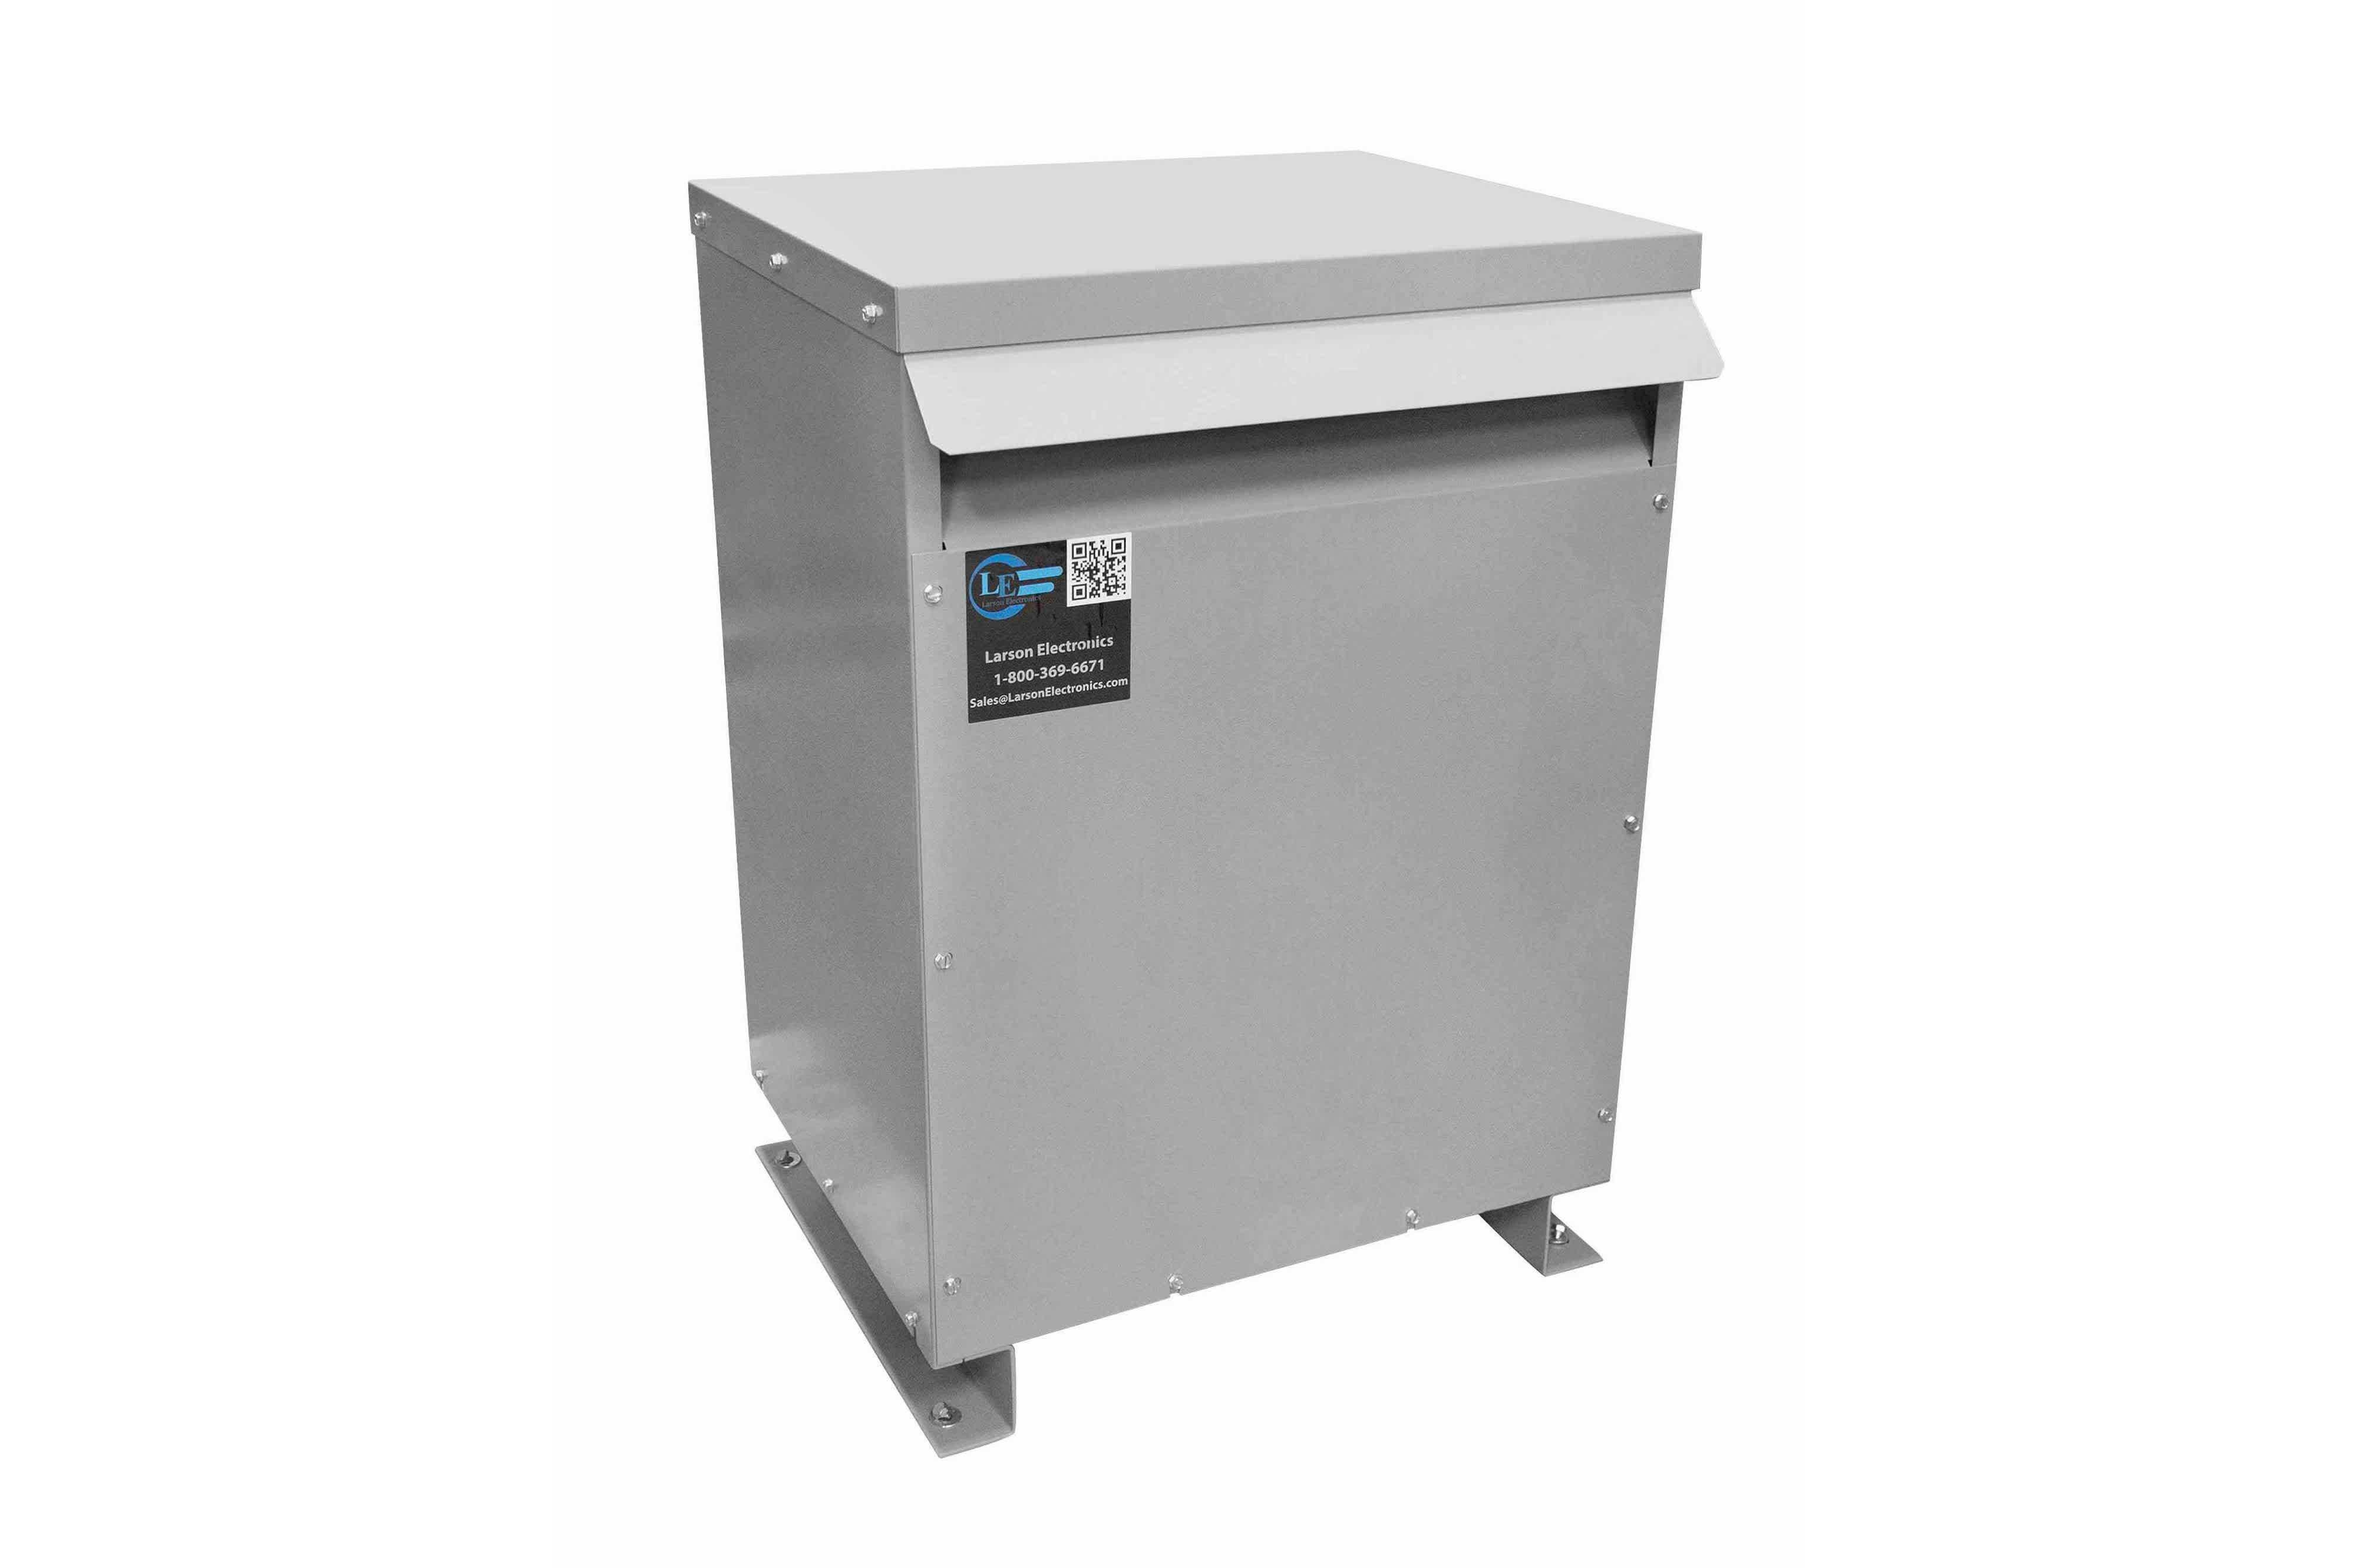 500 kVA 3PH DOE Transformer, 240V Delta Primary, 480Y/277 Wye-N Secondary, N3R, Ventilated, 60 Hz